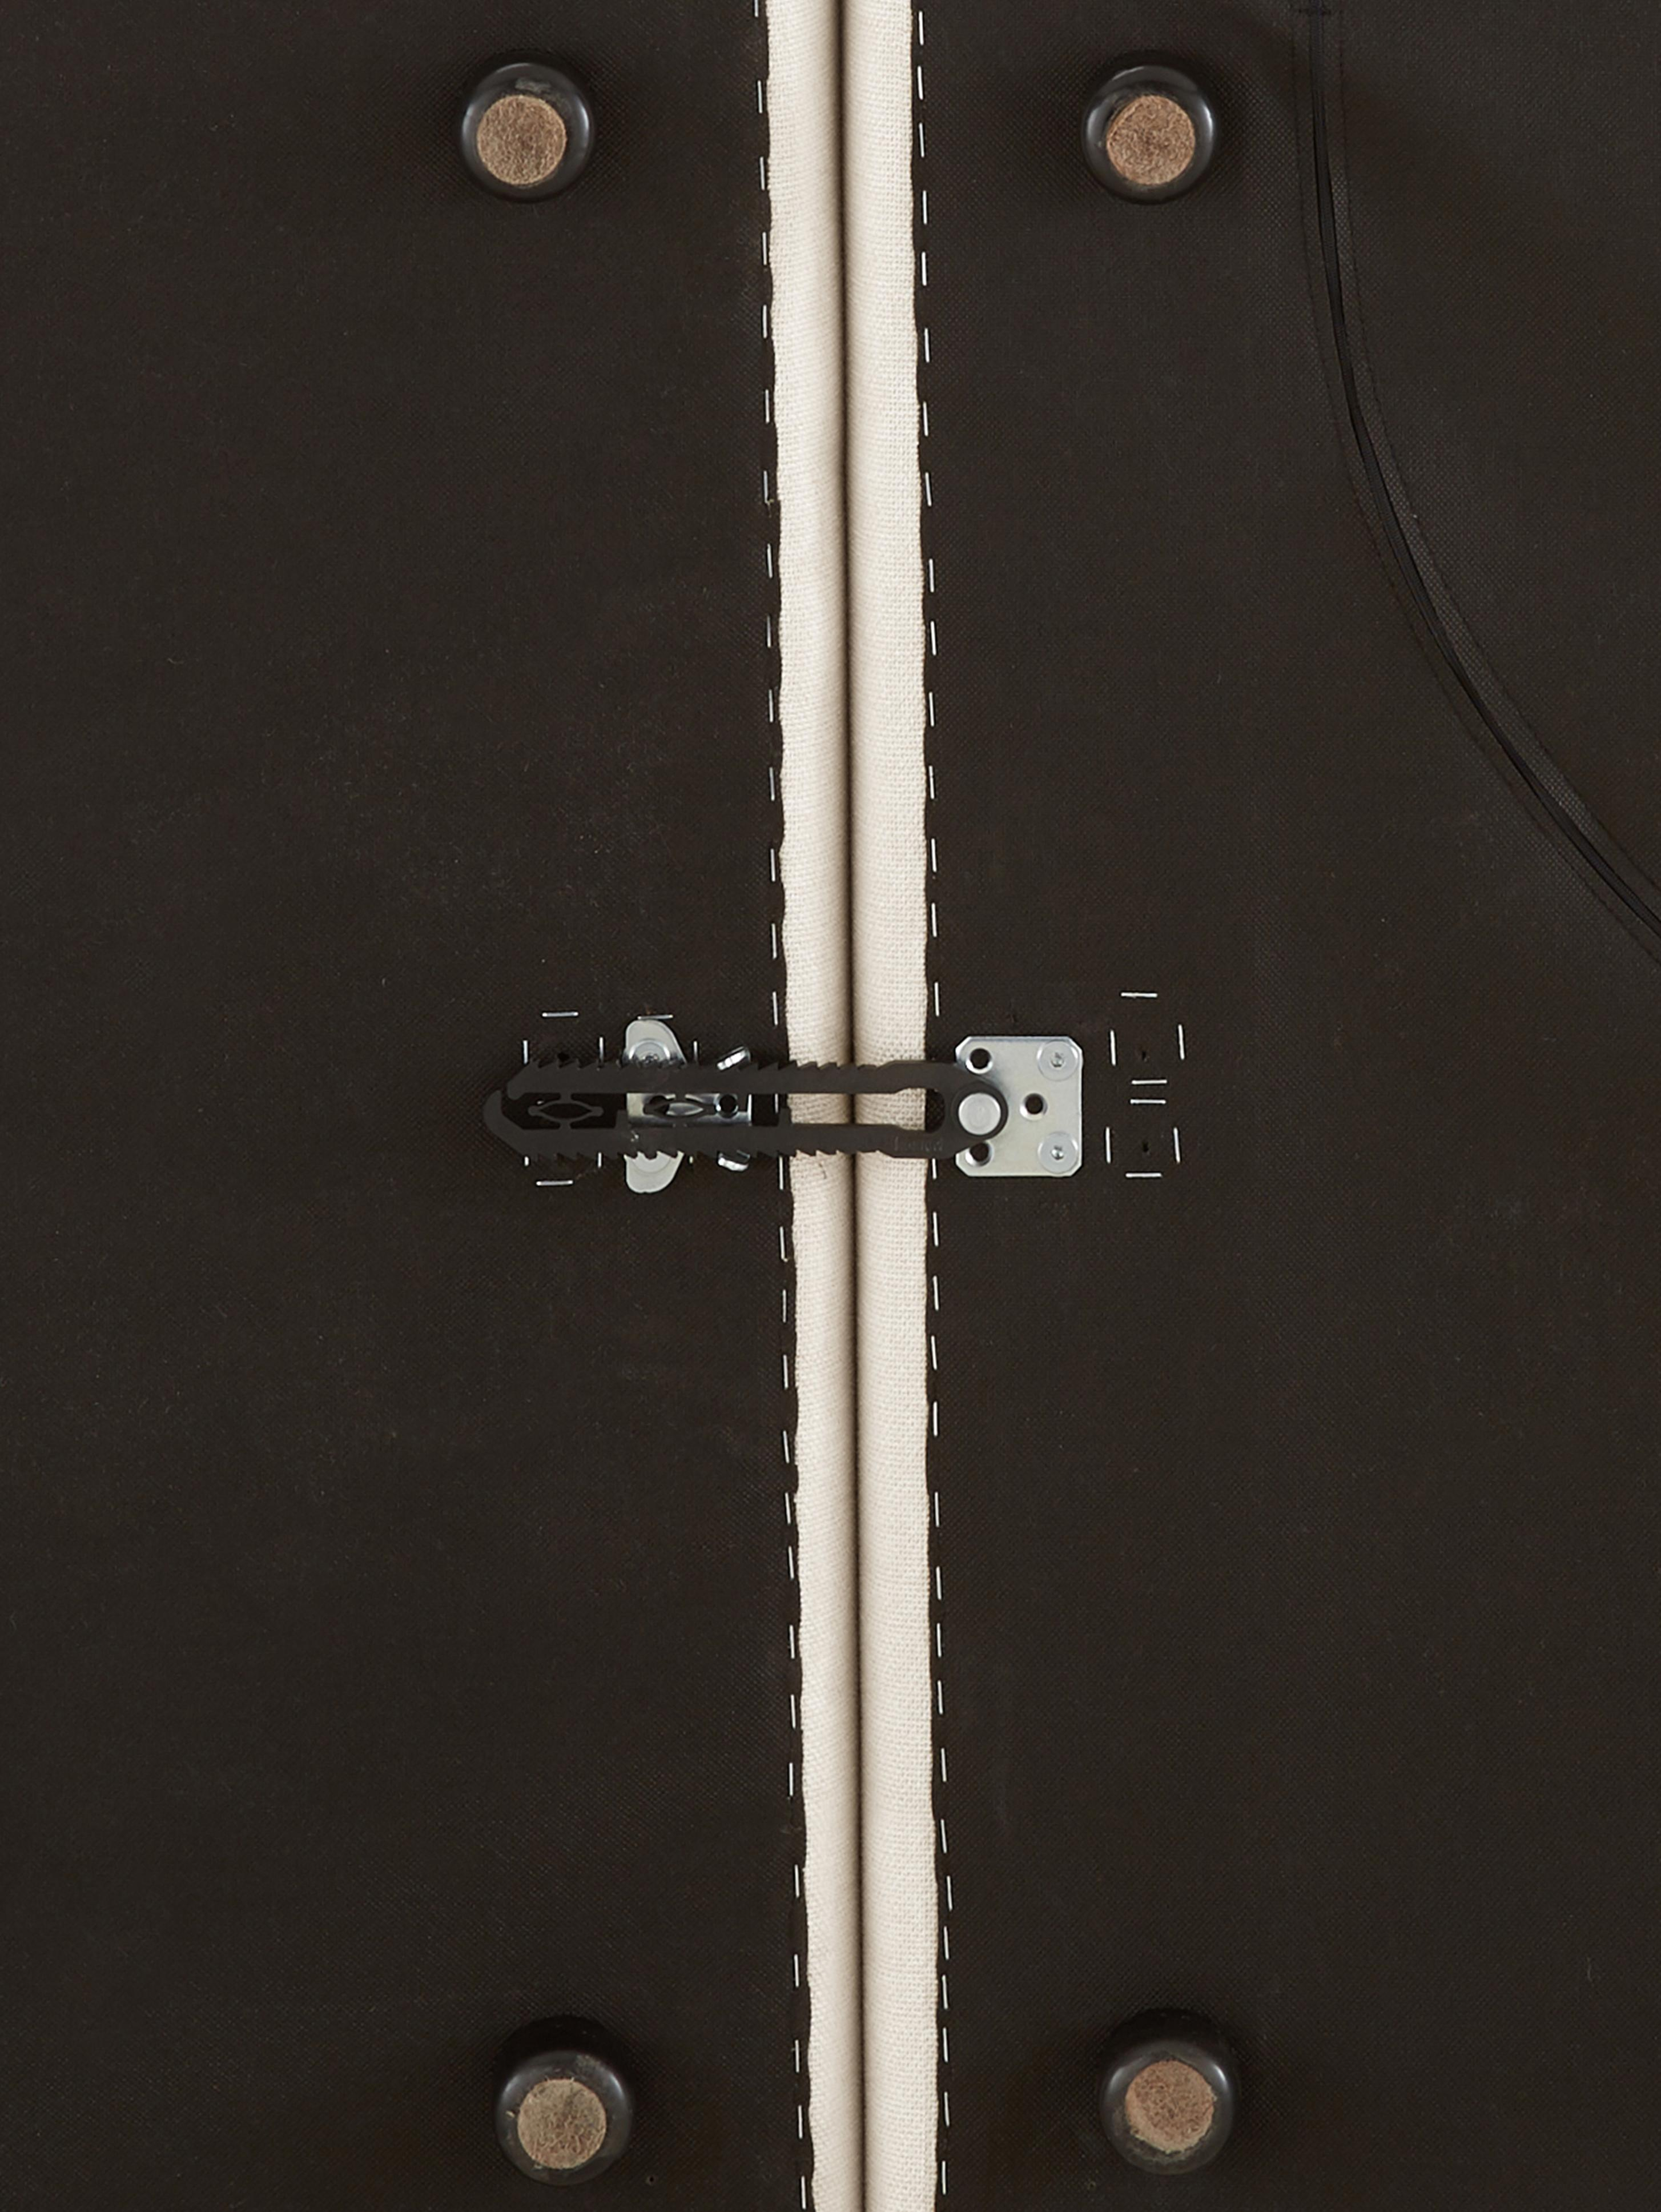 Modulare Ottomane Lennon, Bezug: Polyester 35.000 Scheuert, Gestell: Massives Kiefernholz, Spe, Füße: Kunststoff, Webstoff Beige, B 269 x T 119 cm